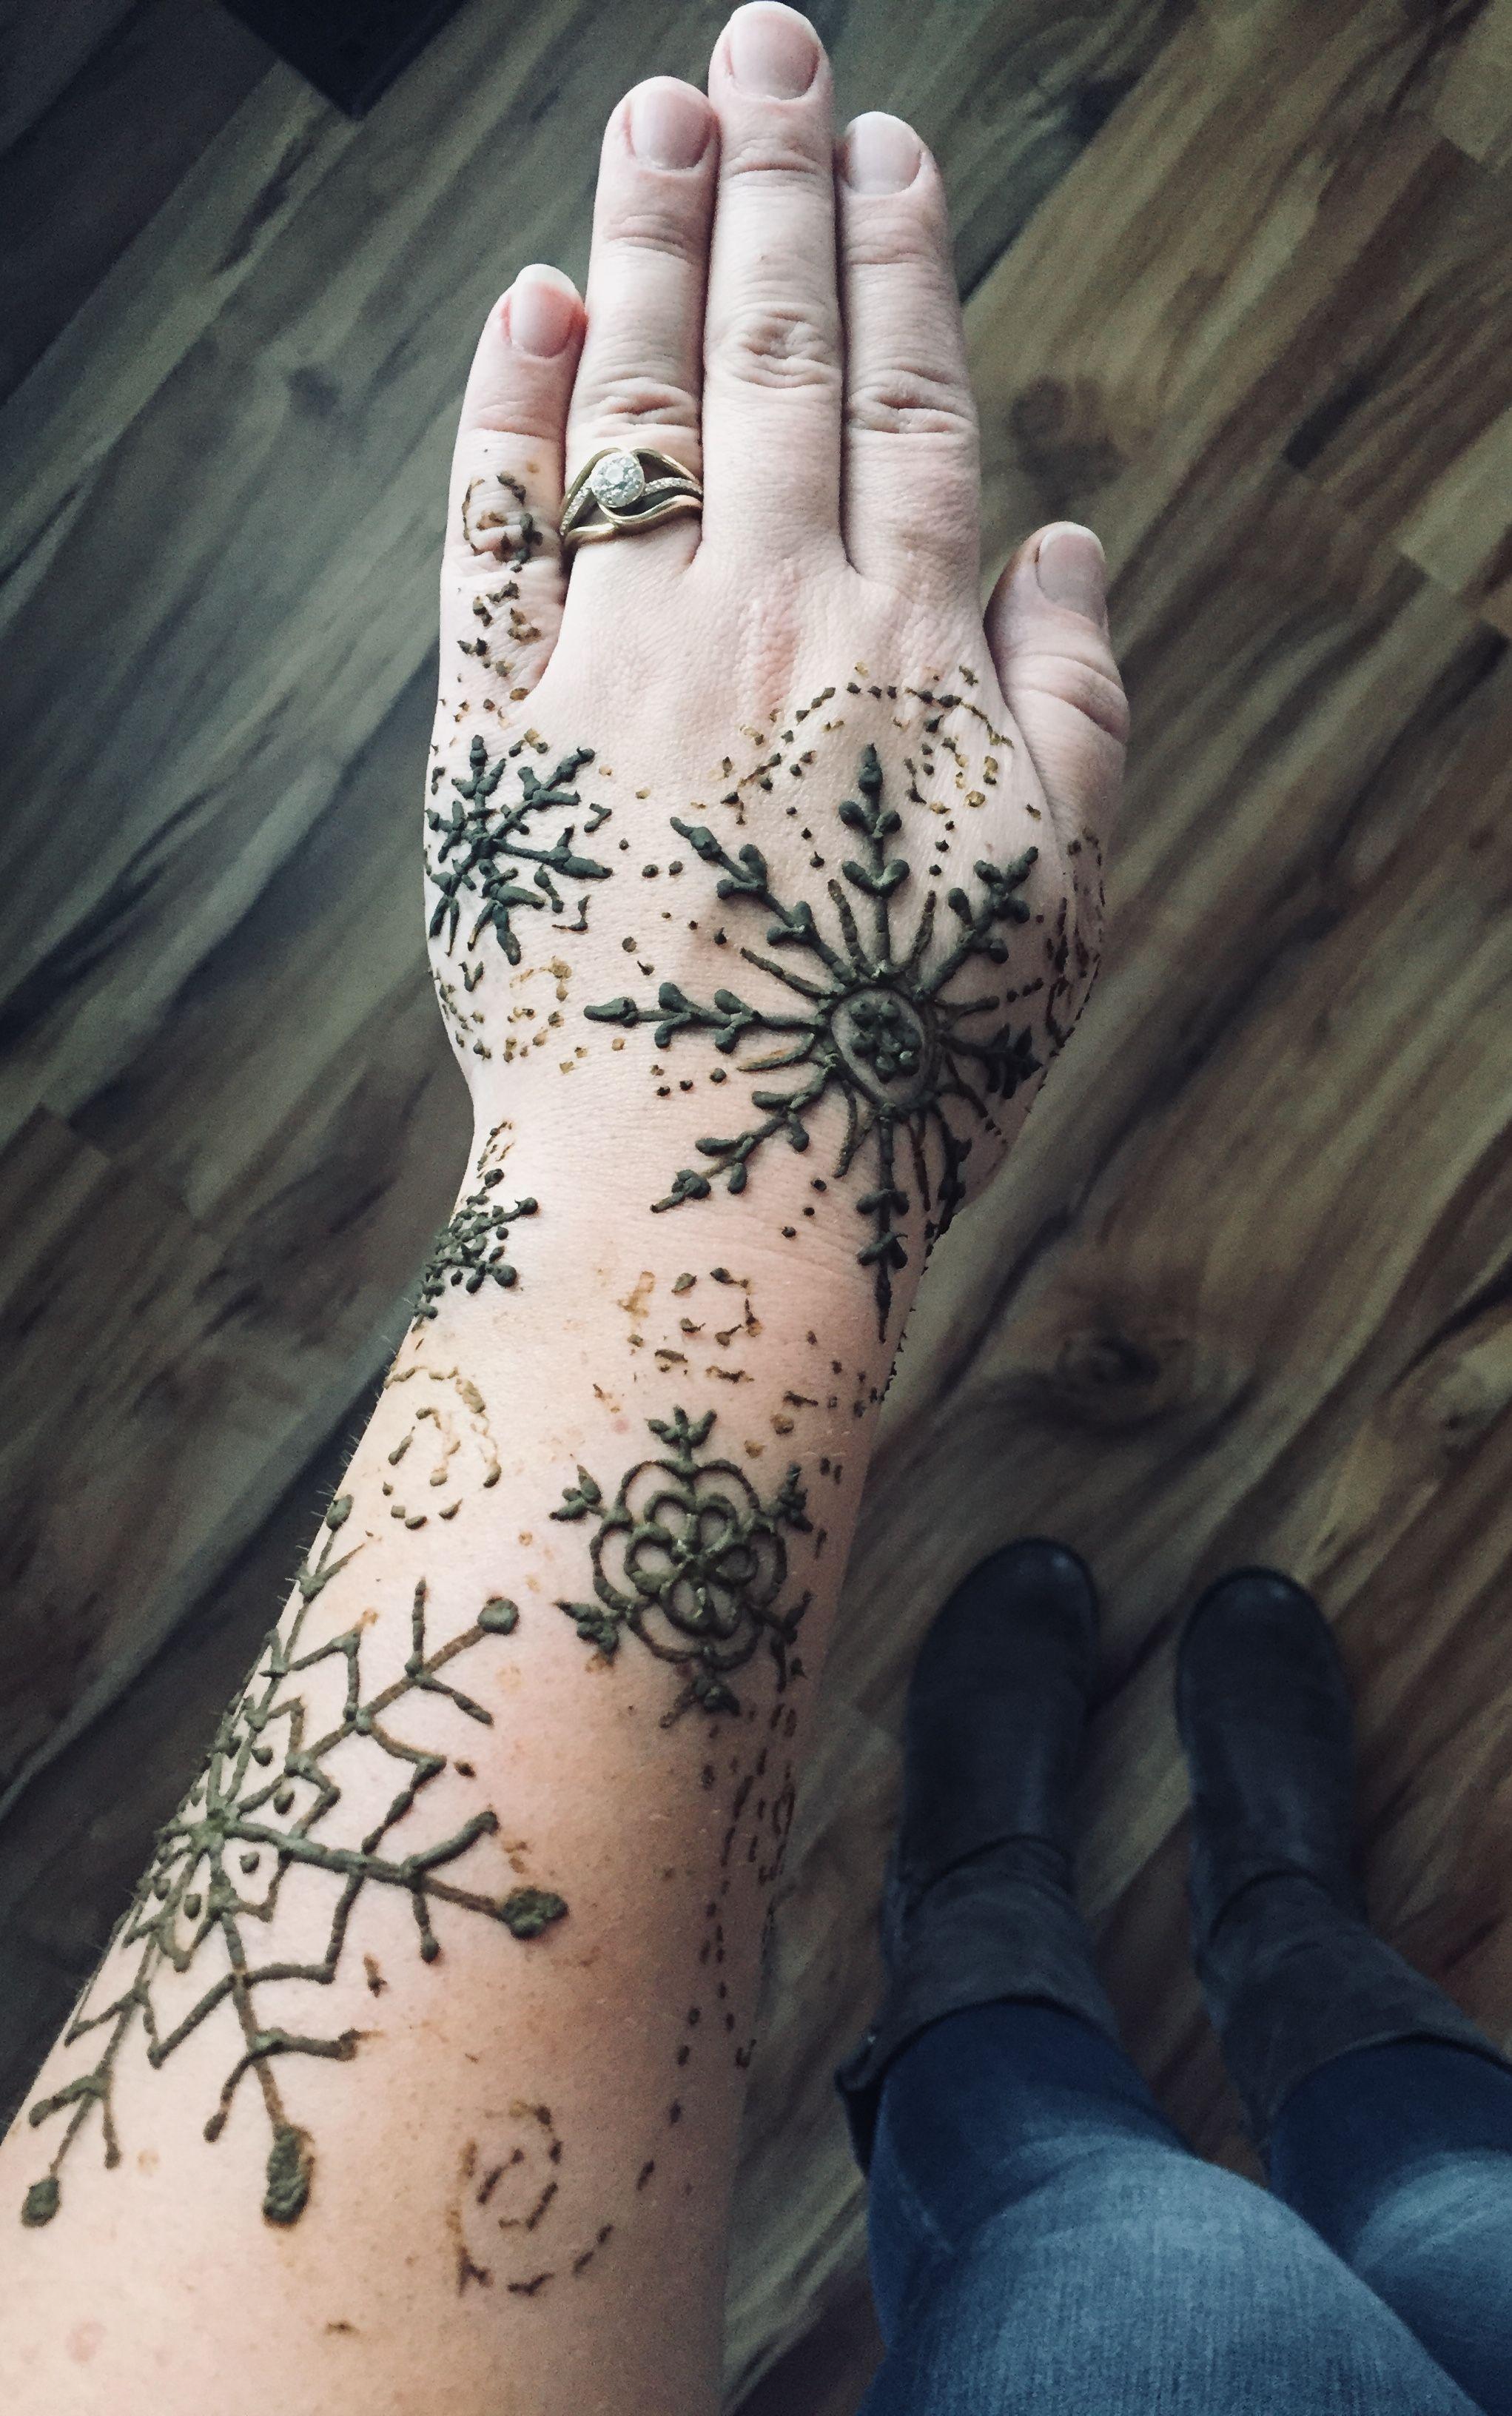 Pin by brittany herz on henna pinterest hennas tattoo and body art